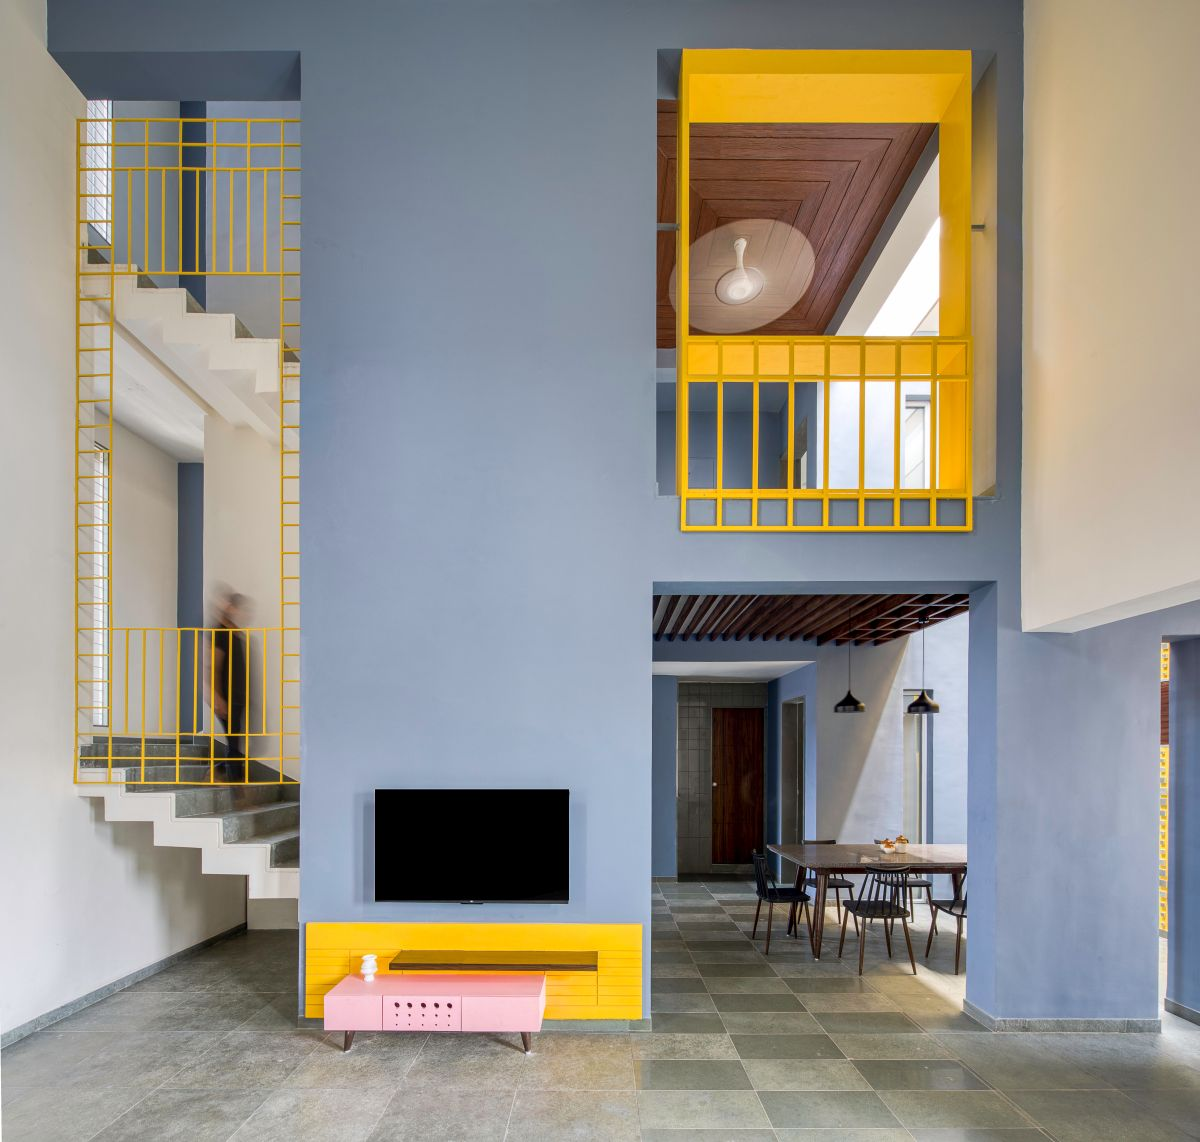 Clay roof tiles façade to minimize heat gain and has decorative function, at Vadodara, by Manoj Patel Design Studio 17